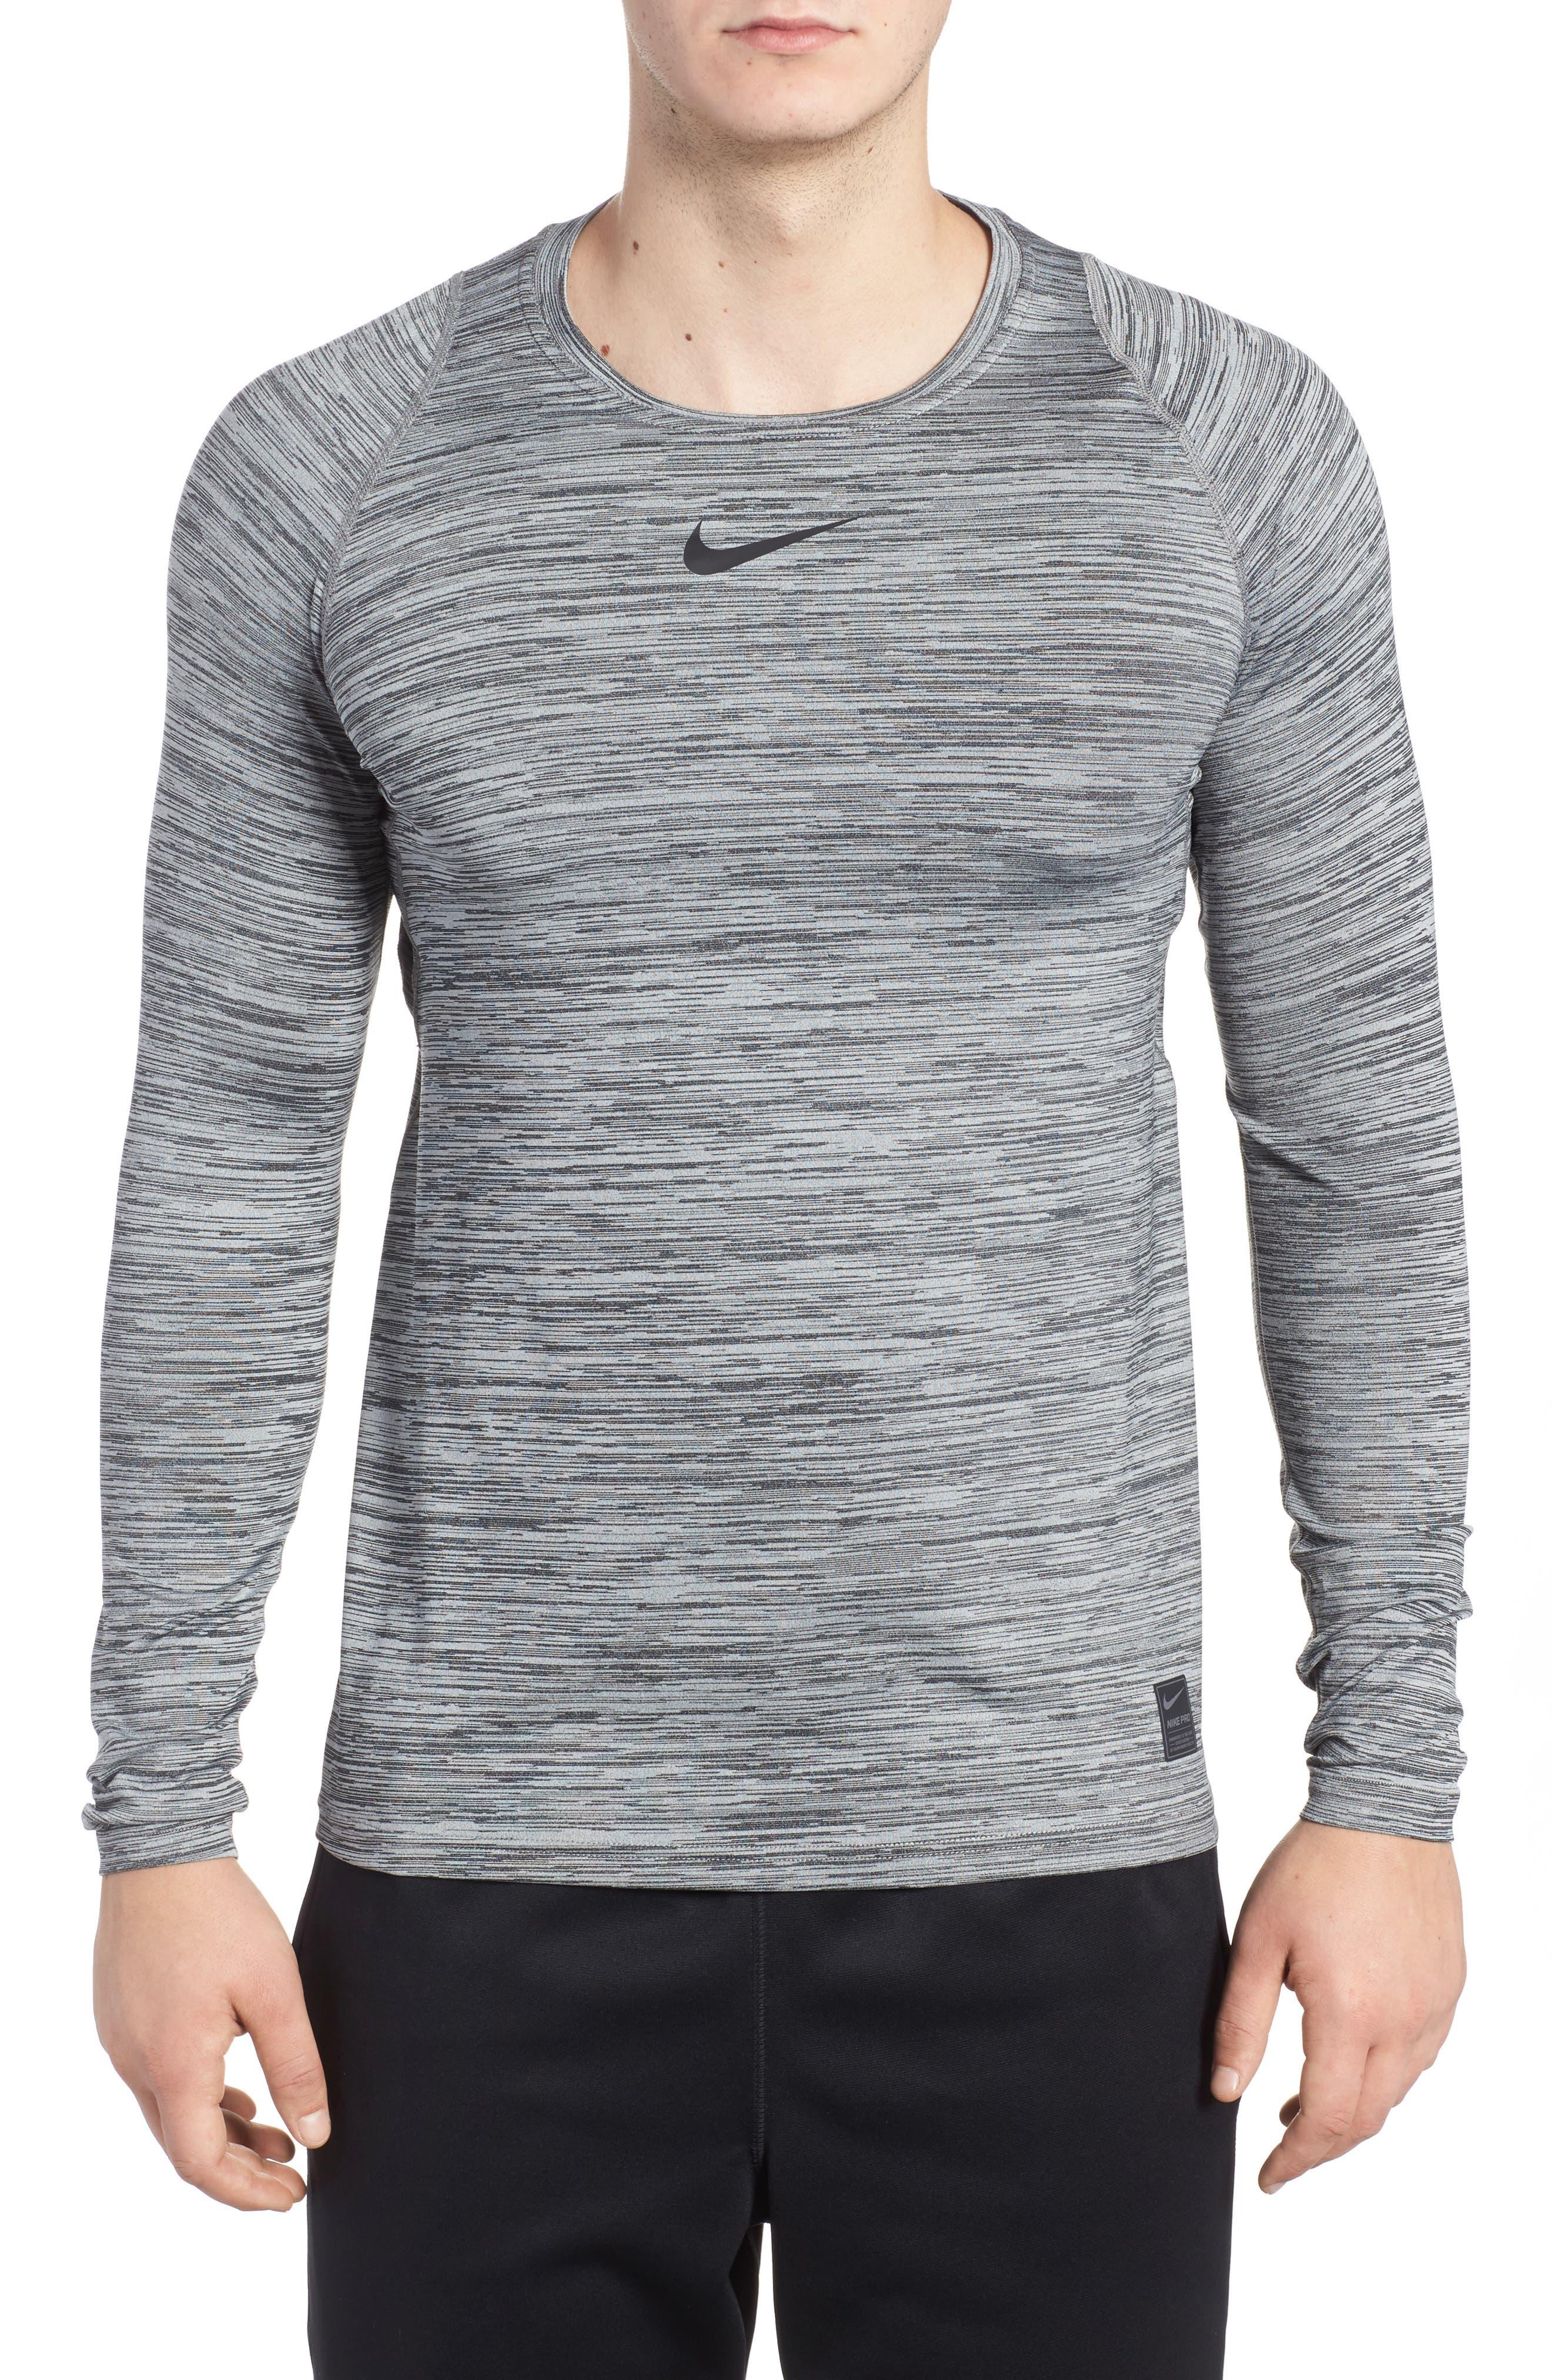 Pro Long Sleeve T-Shirt,                             Main thumbnail 1, color,                             010